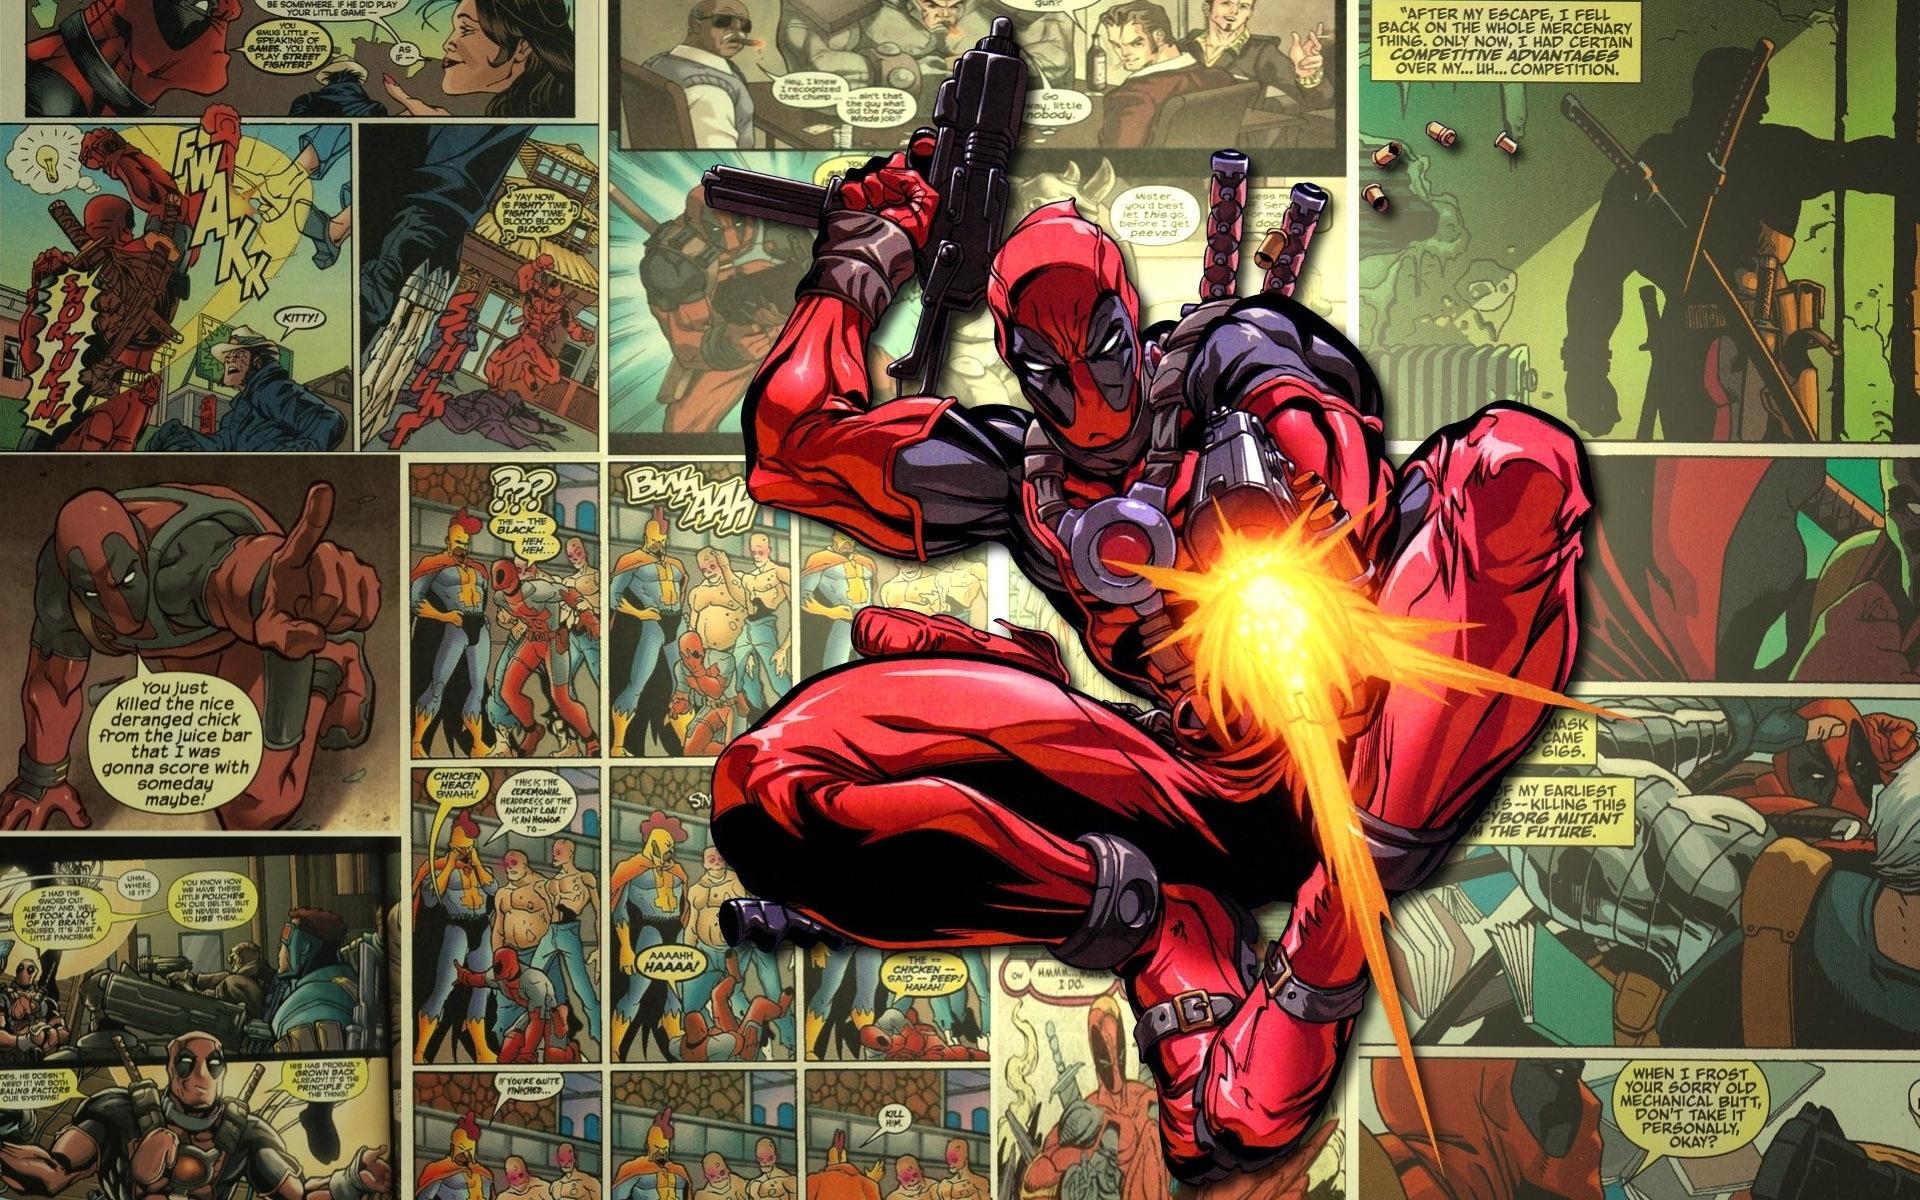 comic book hd wallpaper. - media file | pixelstalk